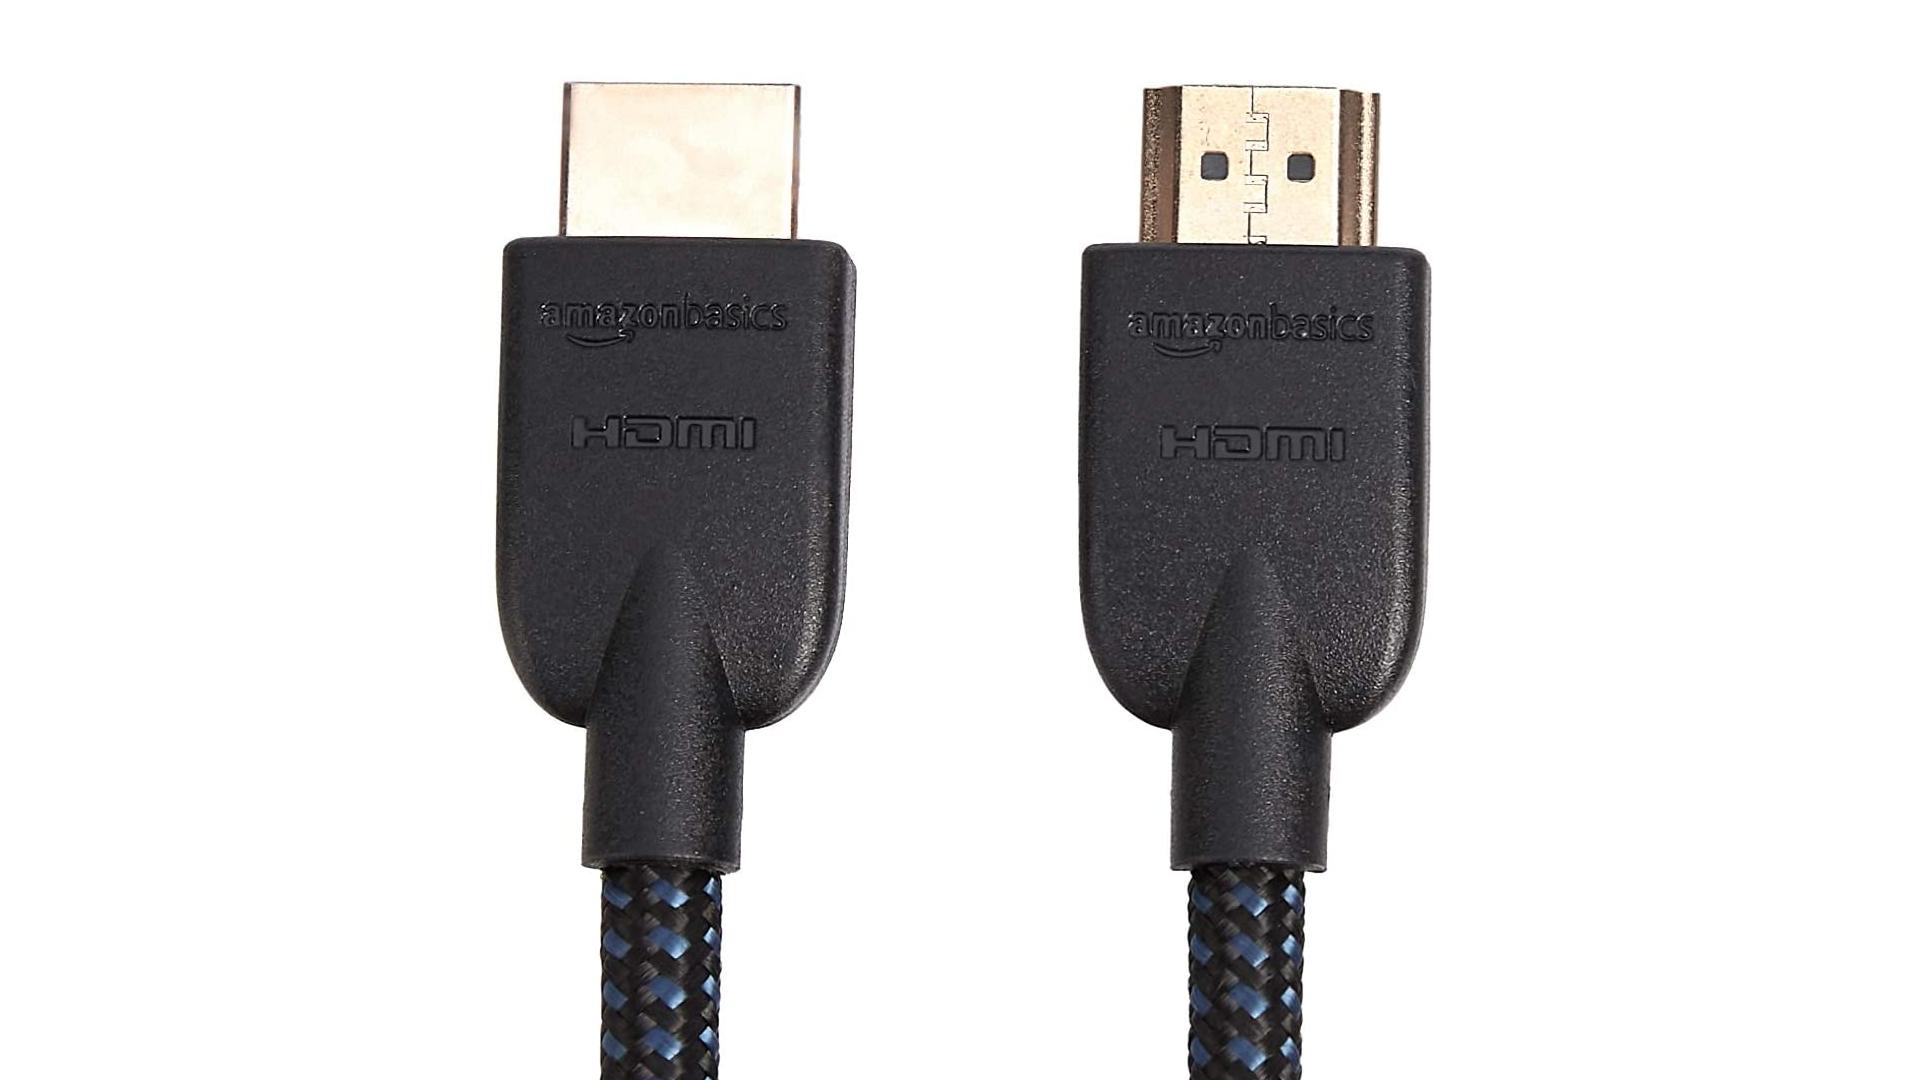 An AmazonBasics HDMI cable.